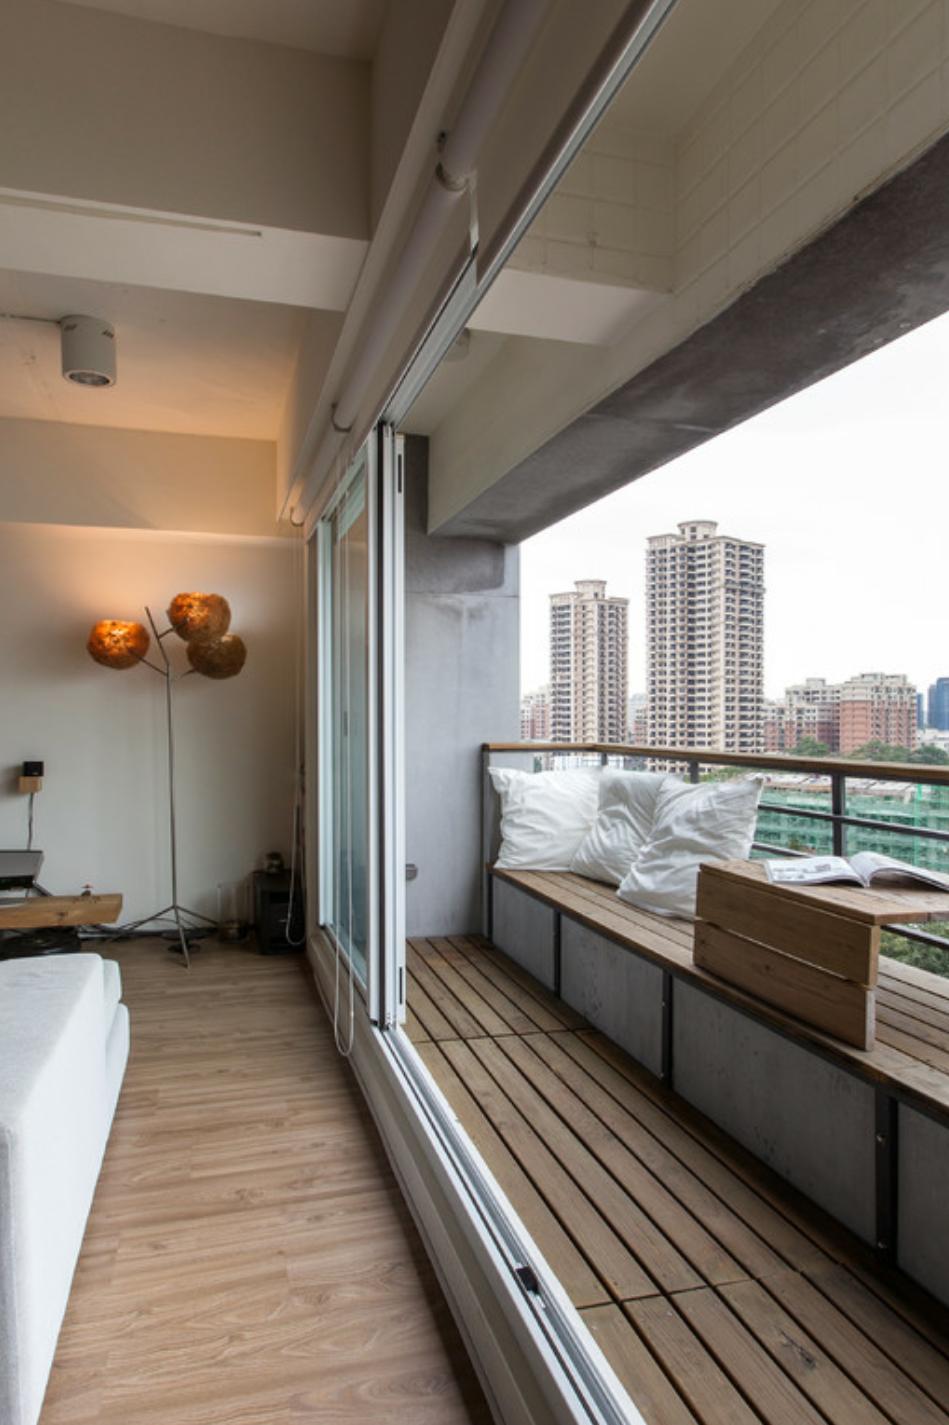 Apartment Balcony S Window Design: Apartment Balcony. Apartment Balcony's Are Usually Small